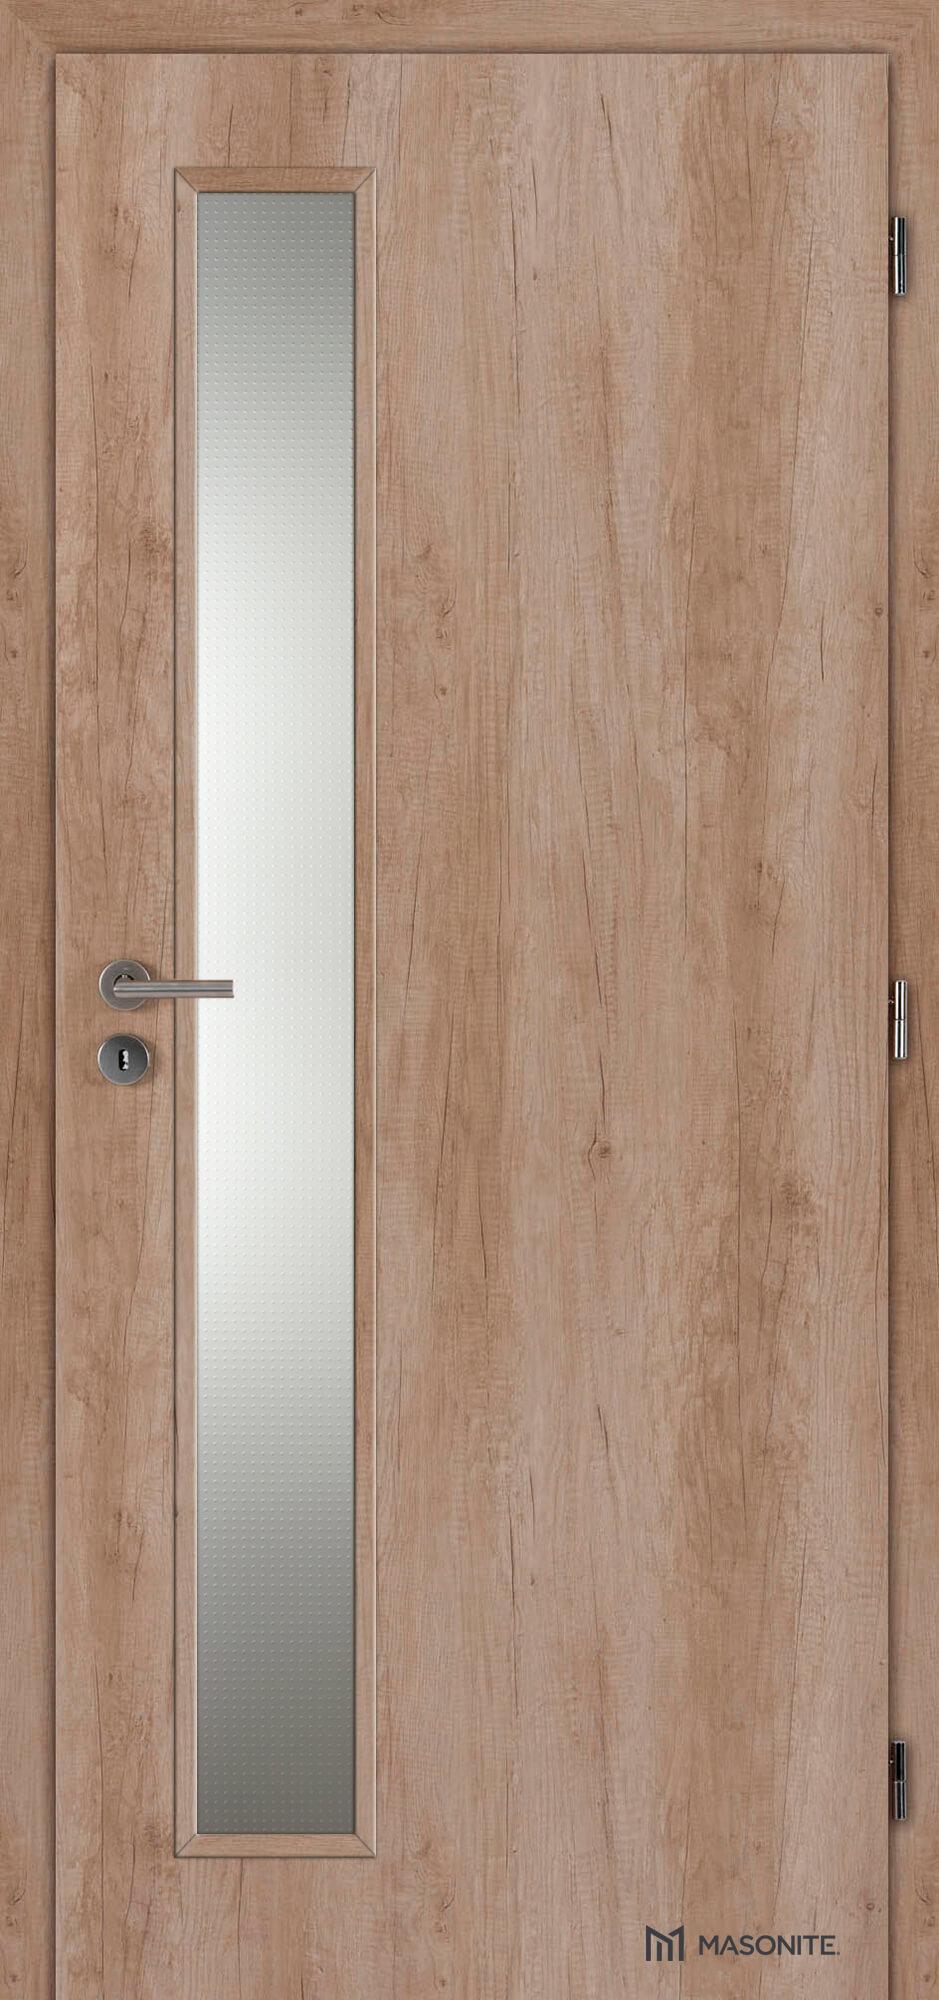 Interiérové dveře Masonite VERTIKA sklo CPL premium